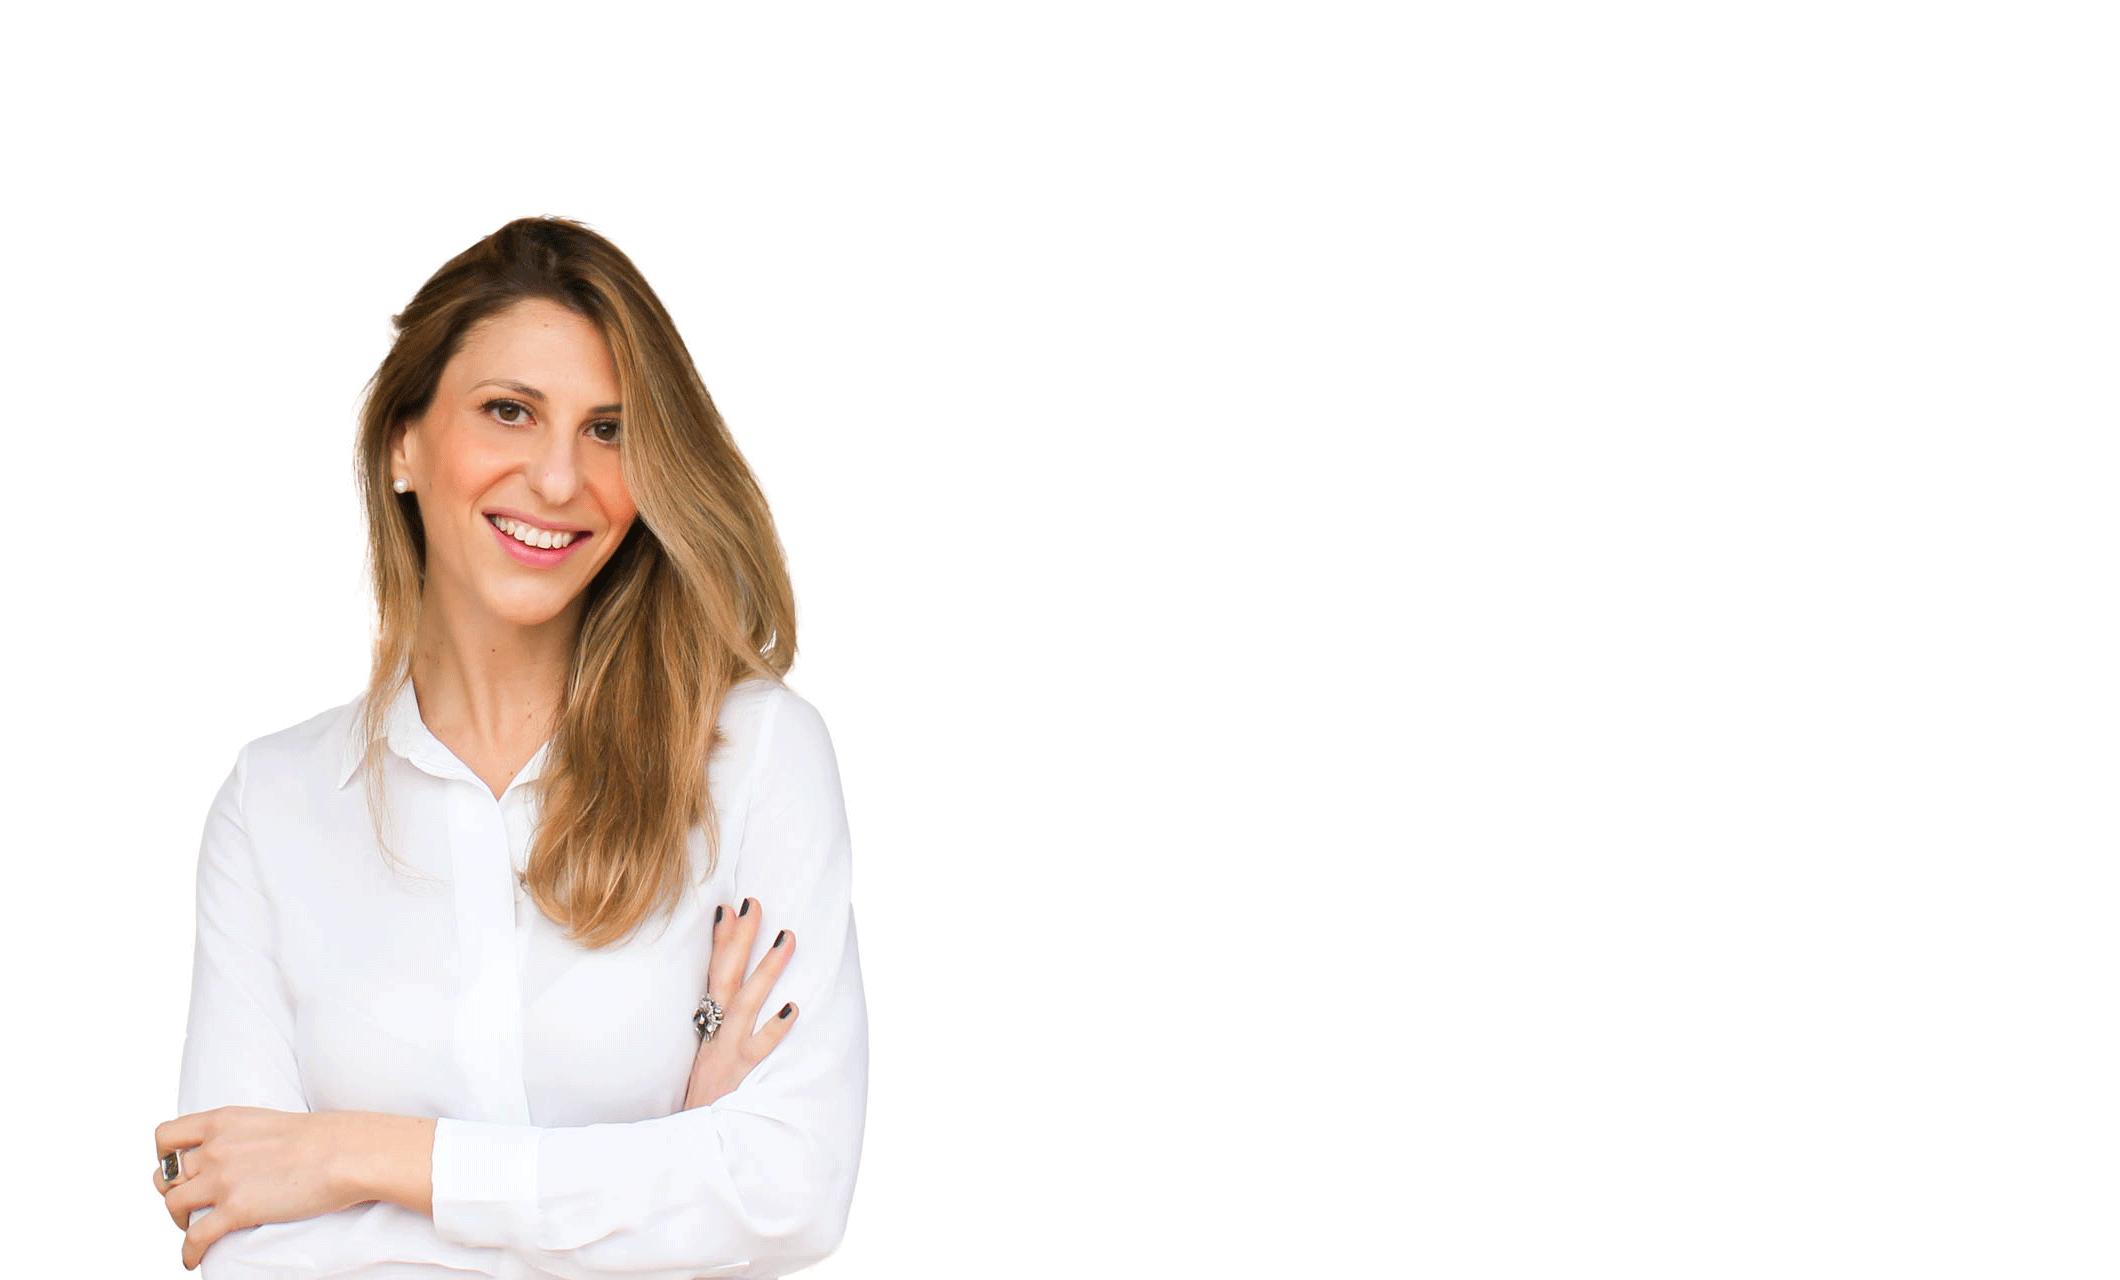 Dott.ssa Viviana Attanasio, Psicologa Psicoterapeuta